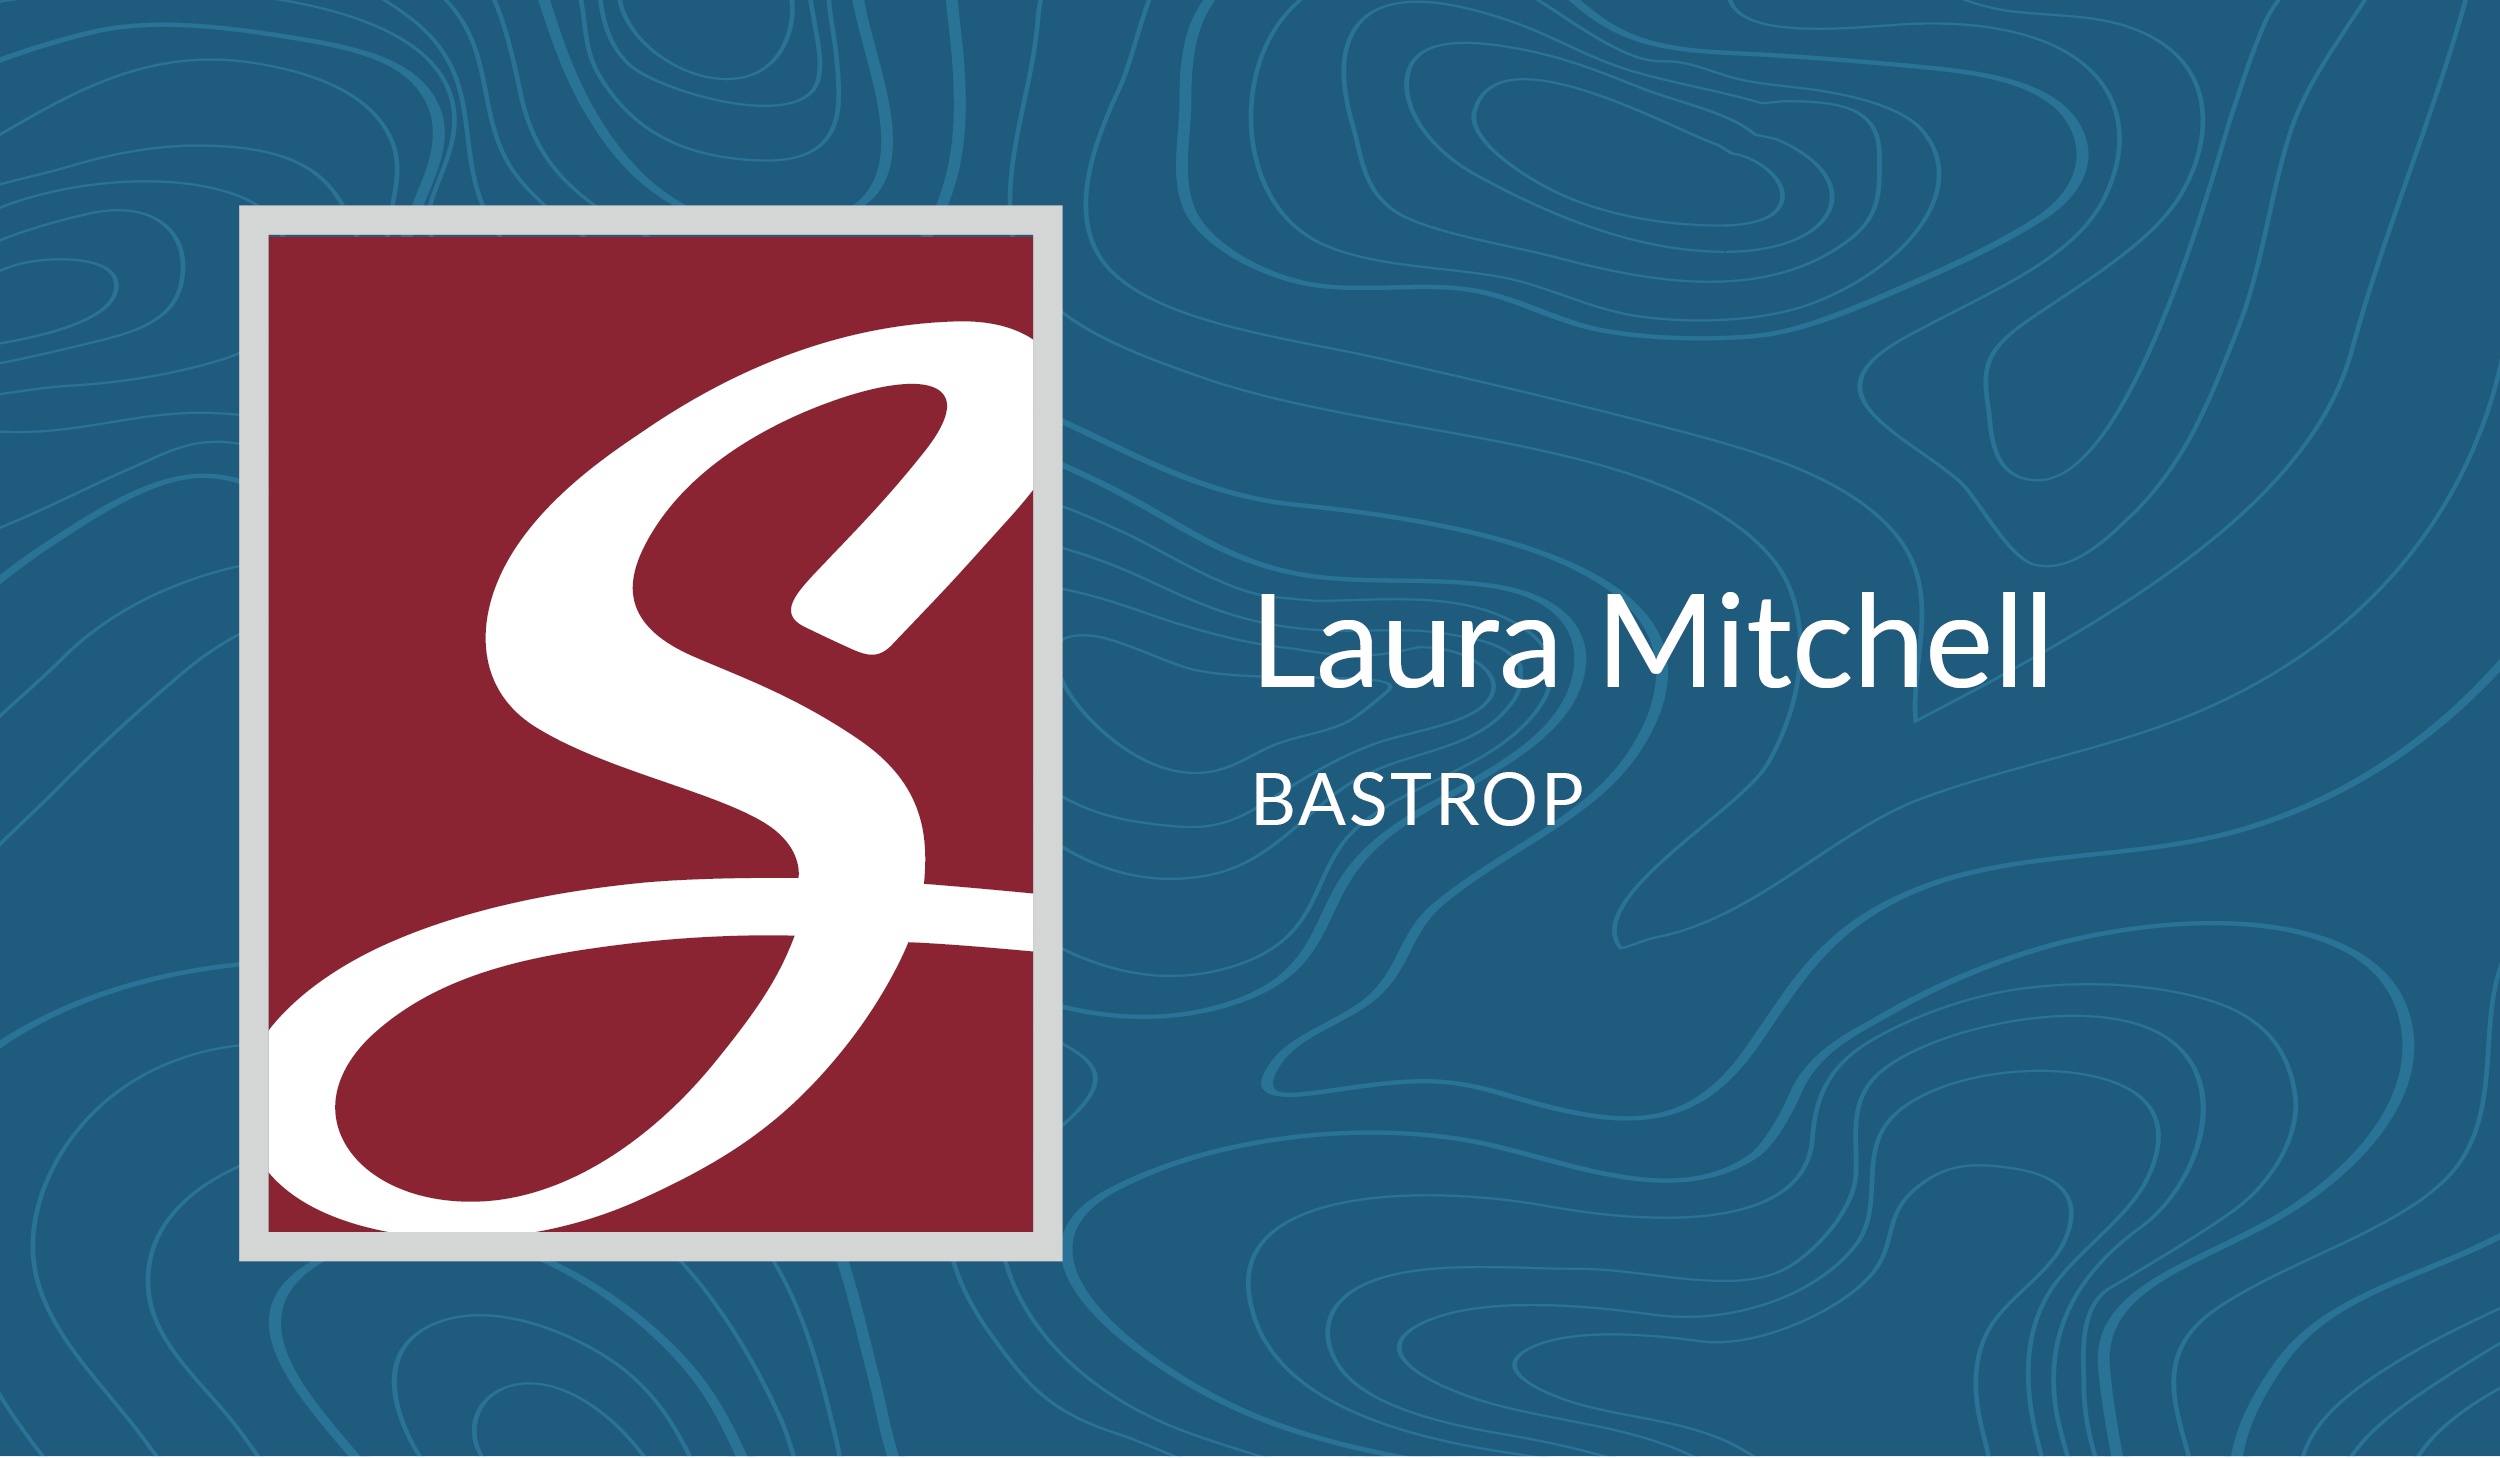 Laura Landing Page Header Image.png